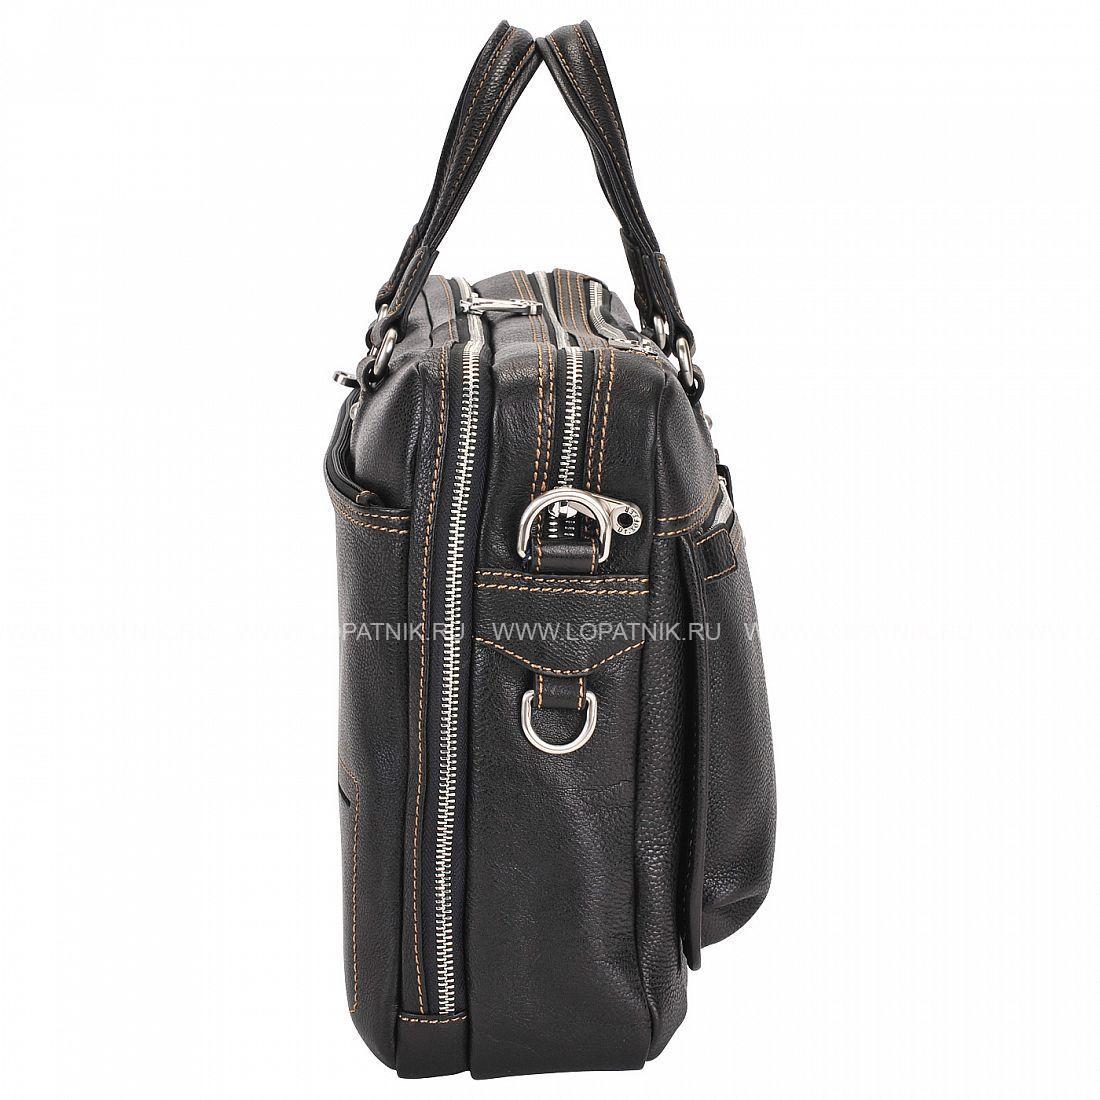 53ffe00cabfc Мужская кожаная деловая сумка Dr.Koffer B402321-02-04, Черный цена ...